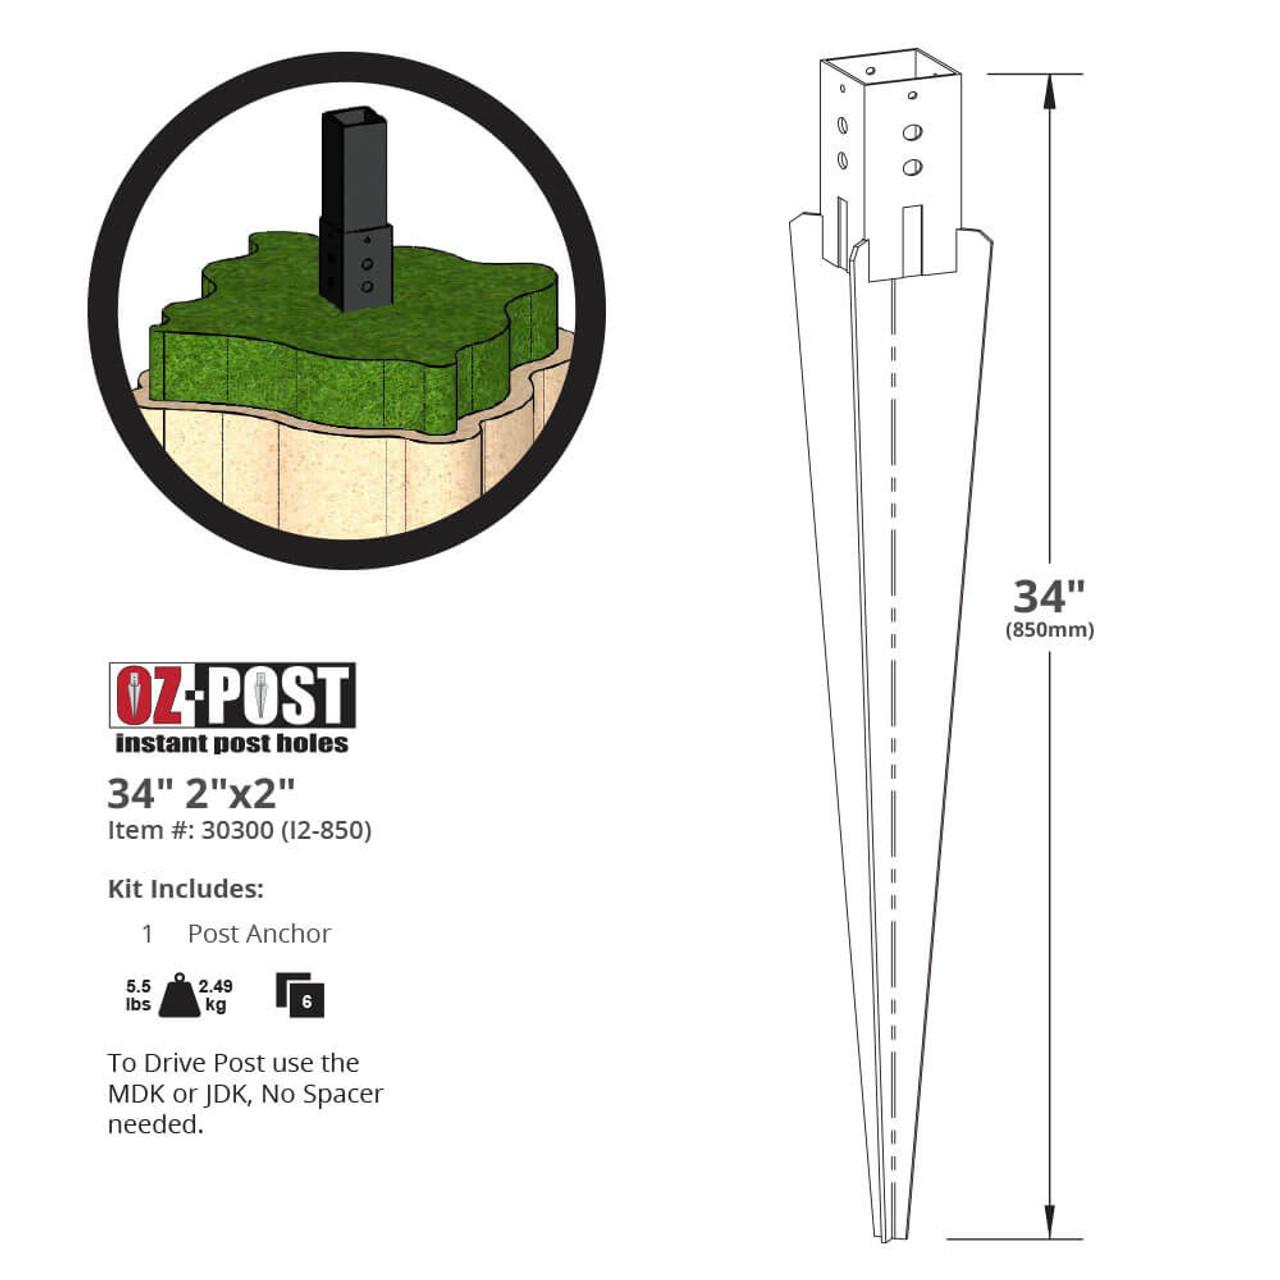 I2-850 OZ-Post Ornamental Post Anchor Dimension Drawing